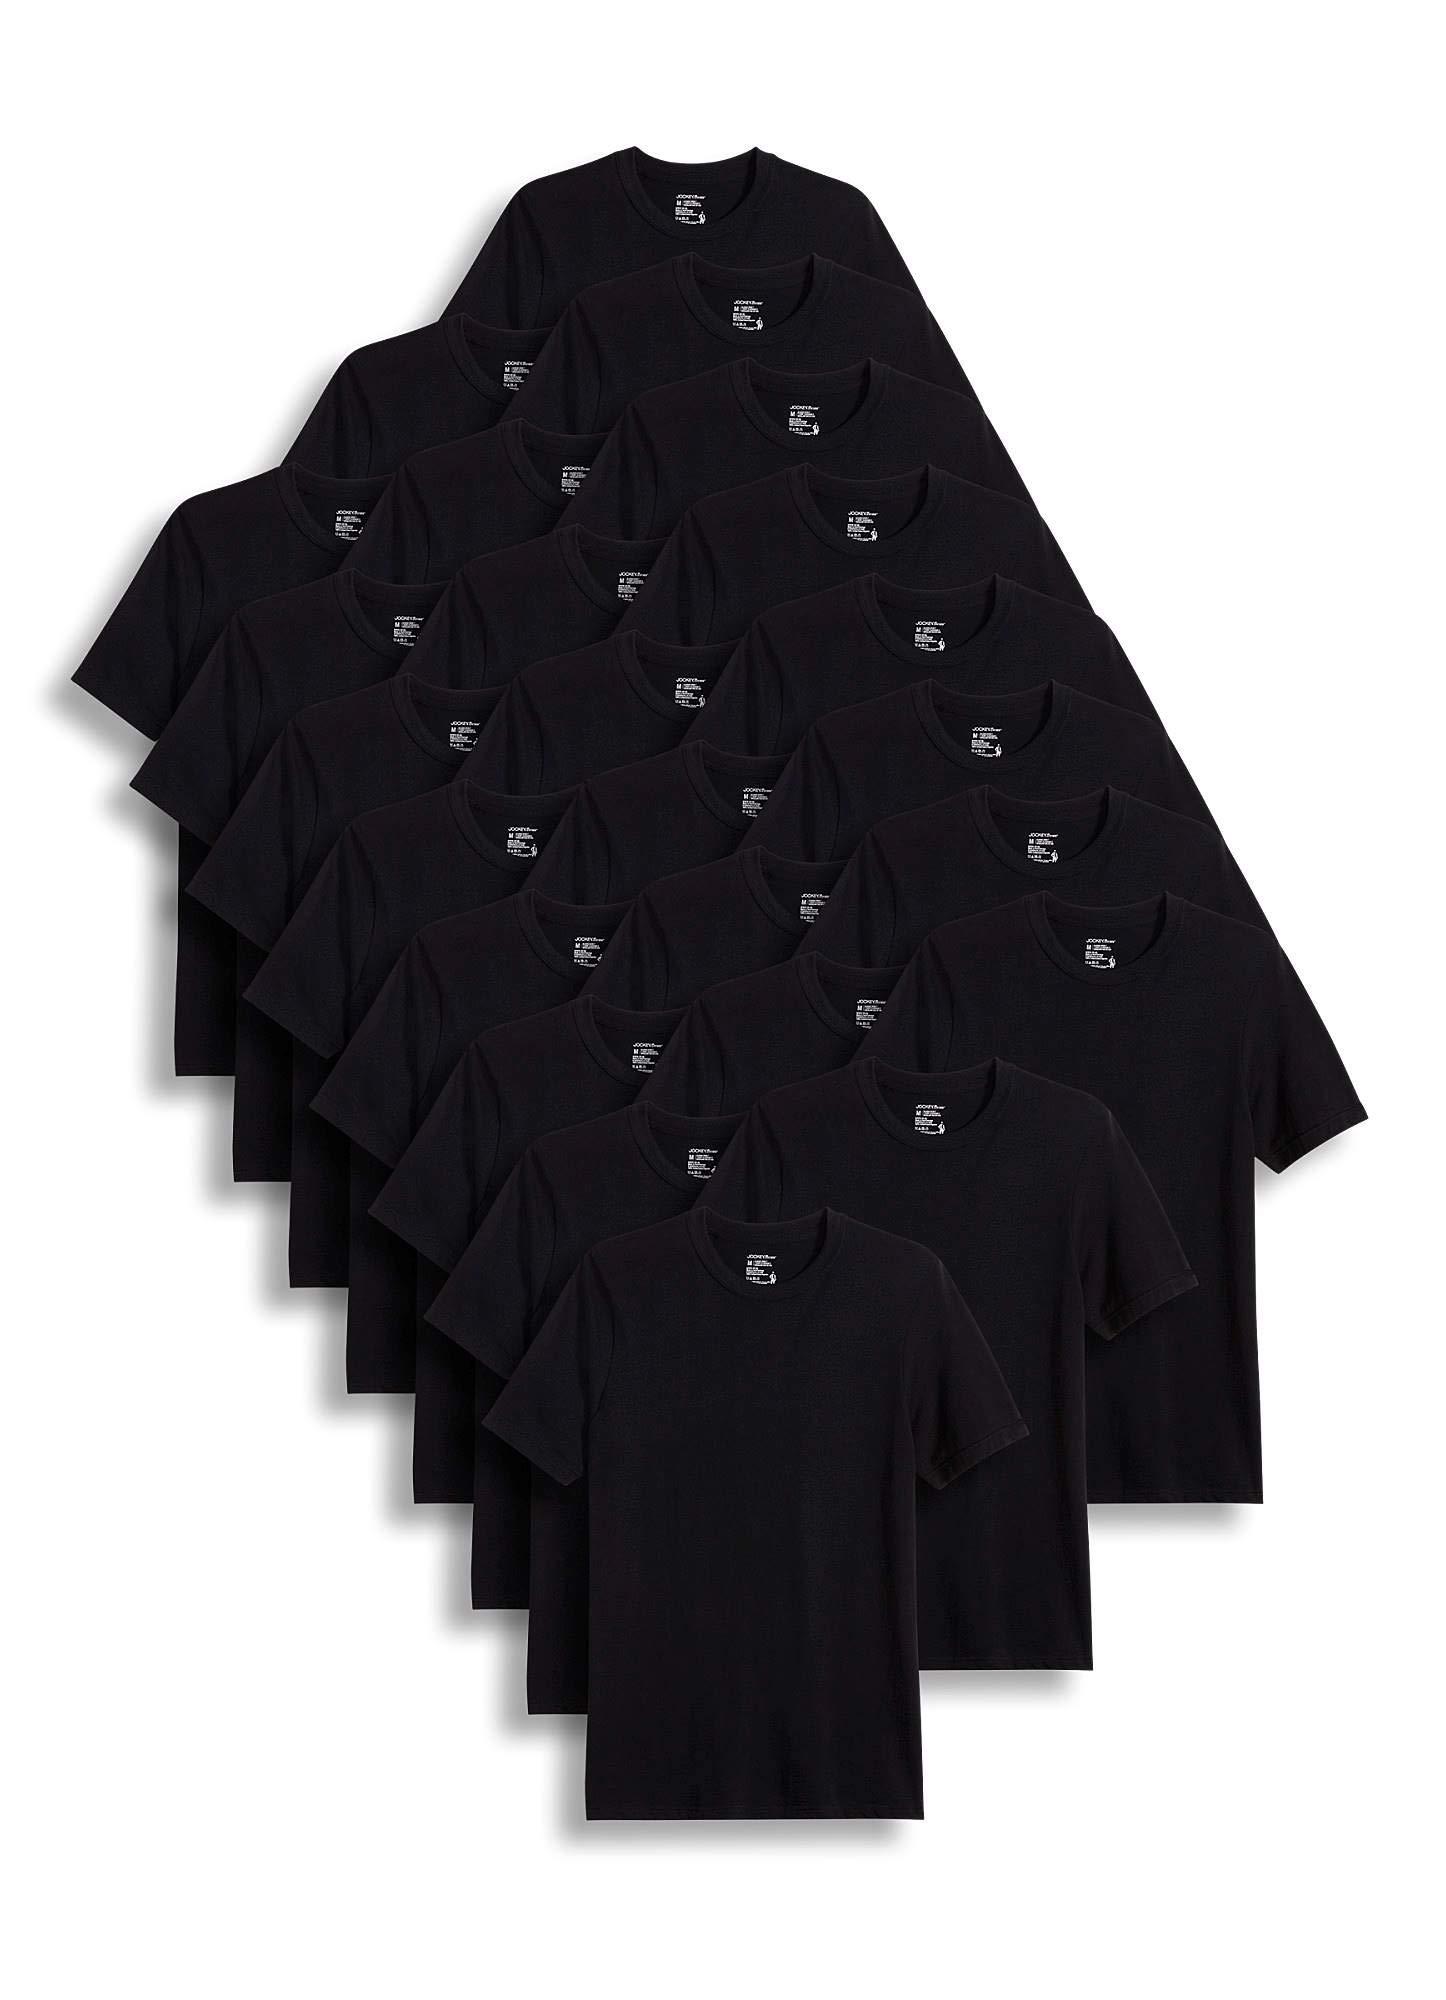 Jockey Men's T-Shirts Classic Crew Neck T-Shirt - 24 Pack, Black, XL